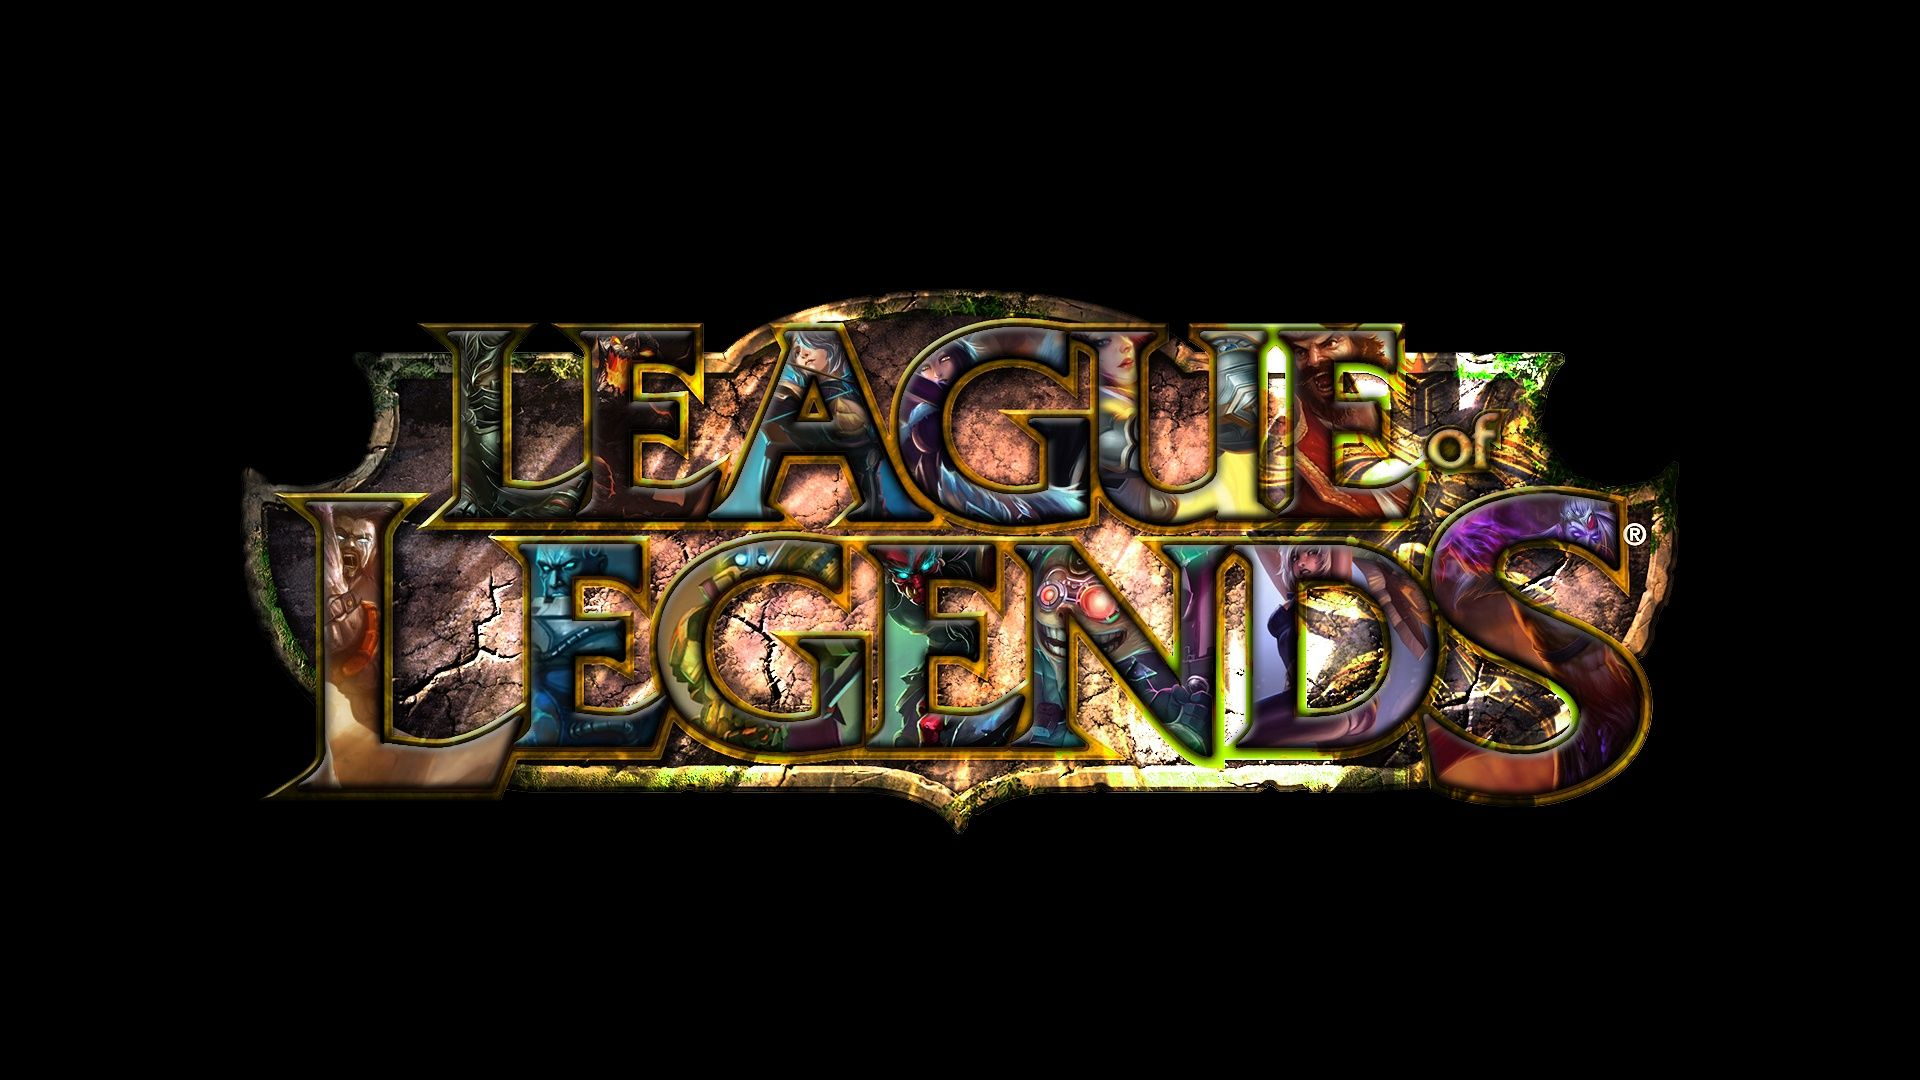 b4212a1a129c827bf71068fc9287298f - Good Vpn For League Of Legends